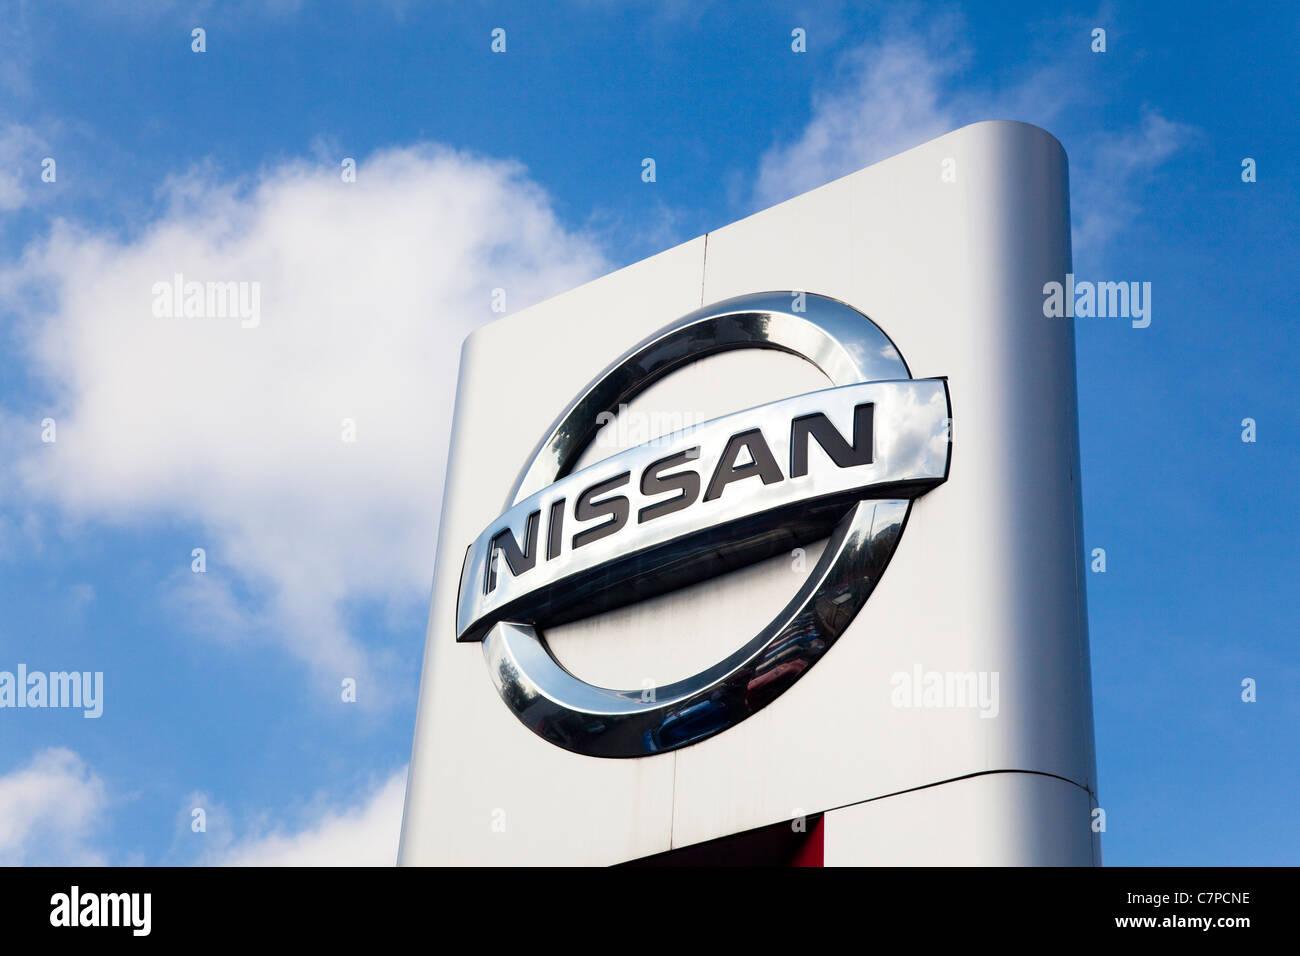 Nissan main dealers sign, London, UK - Stock Image